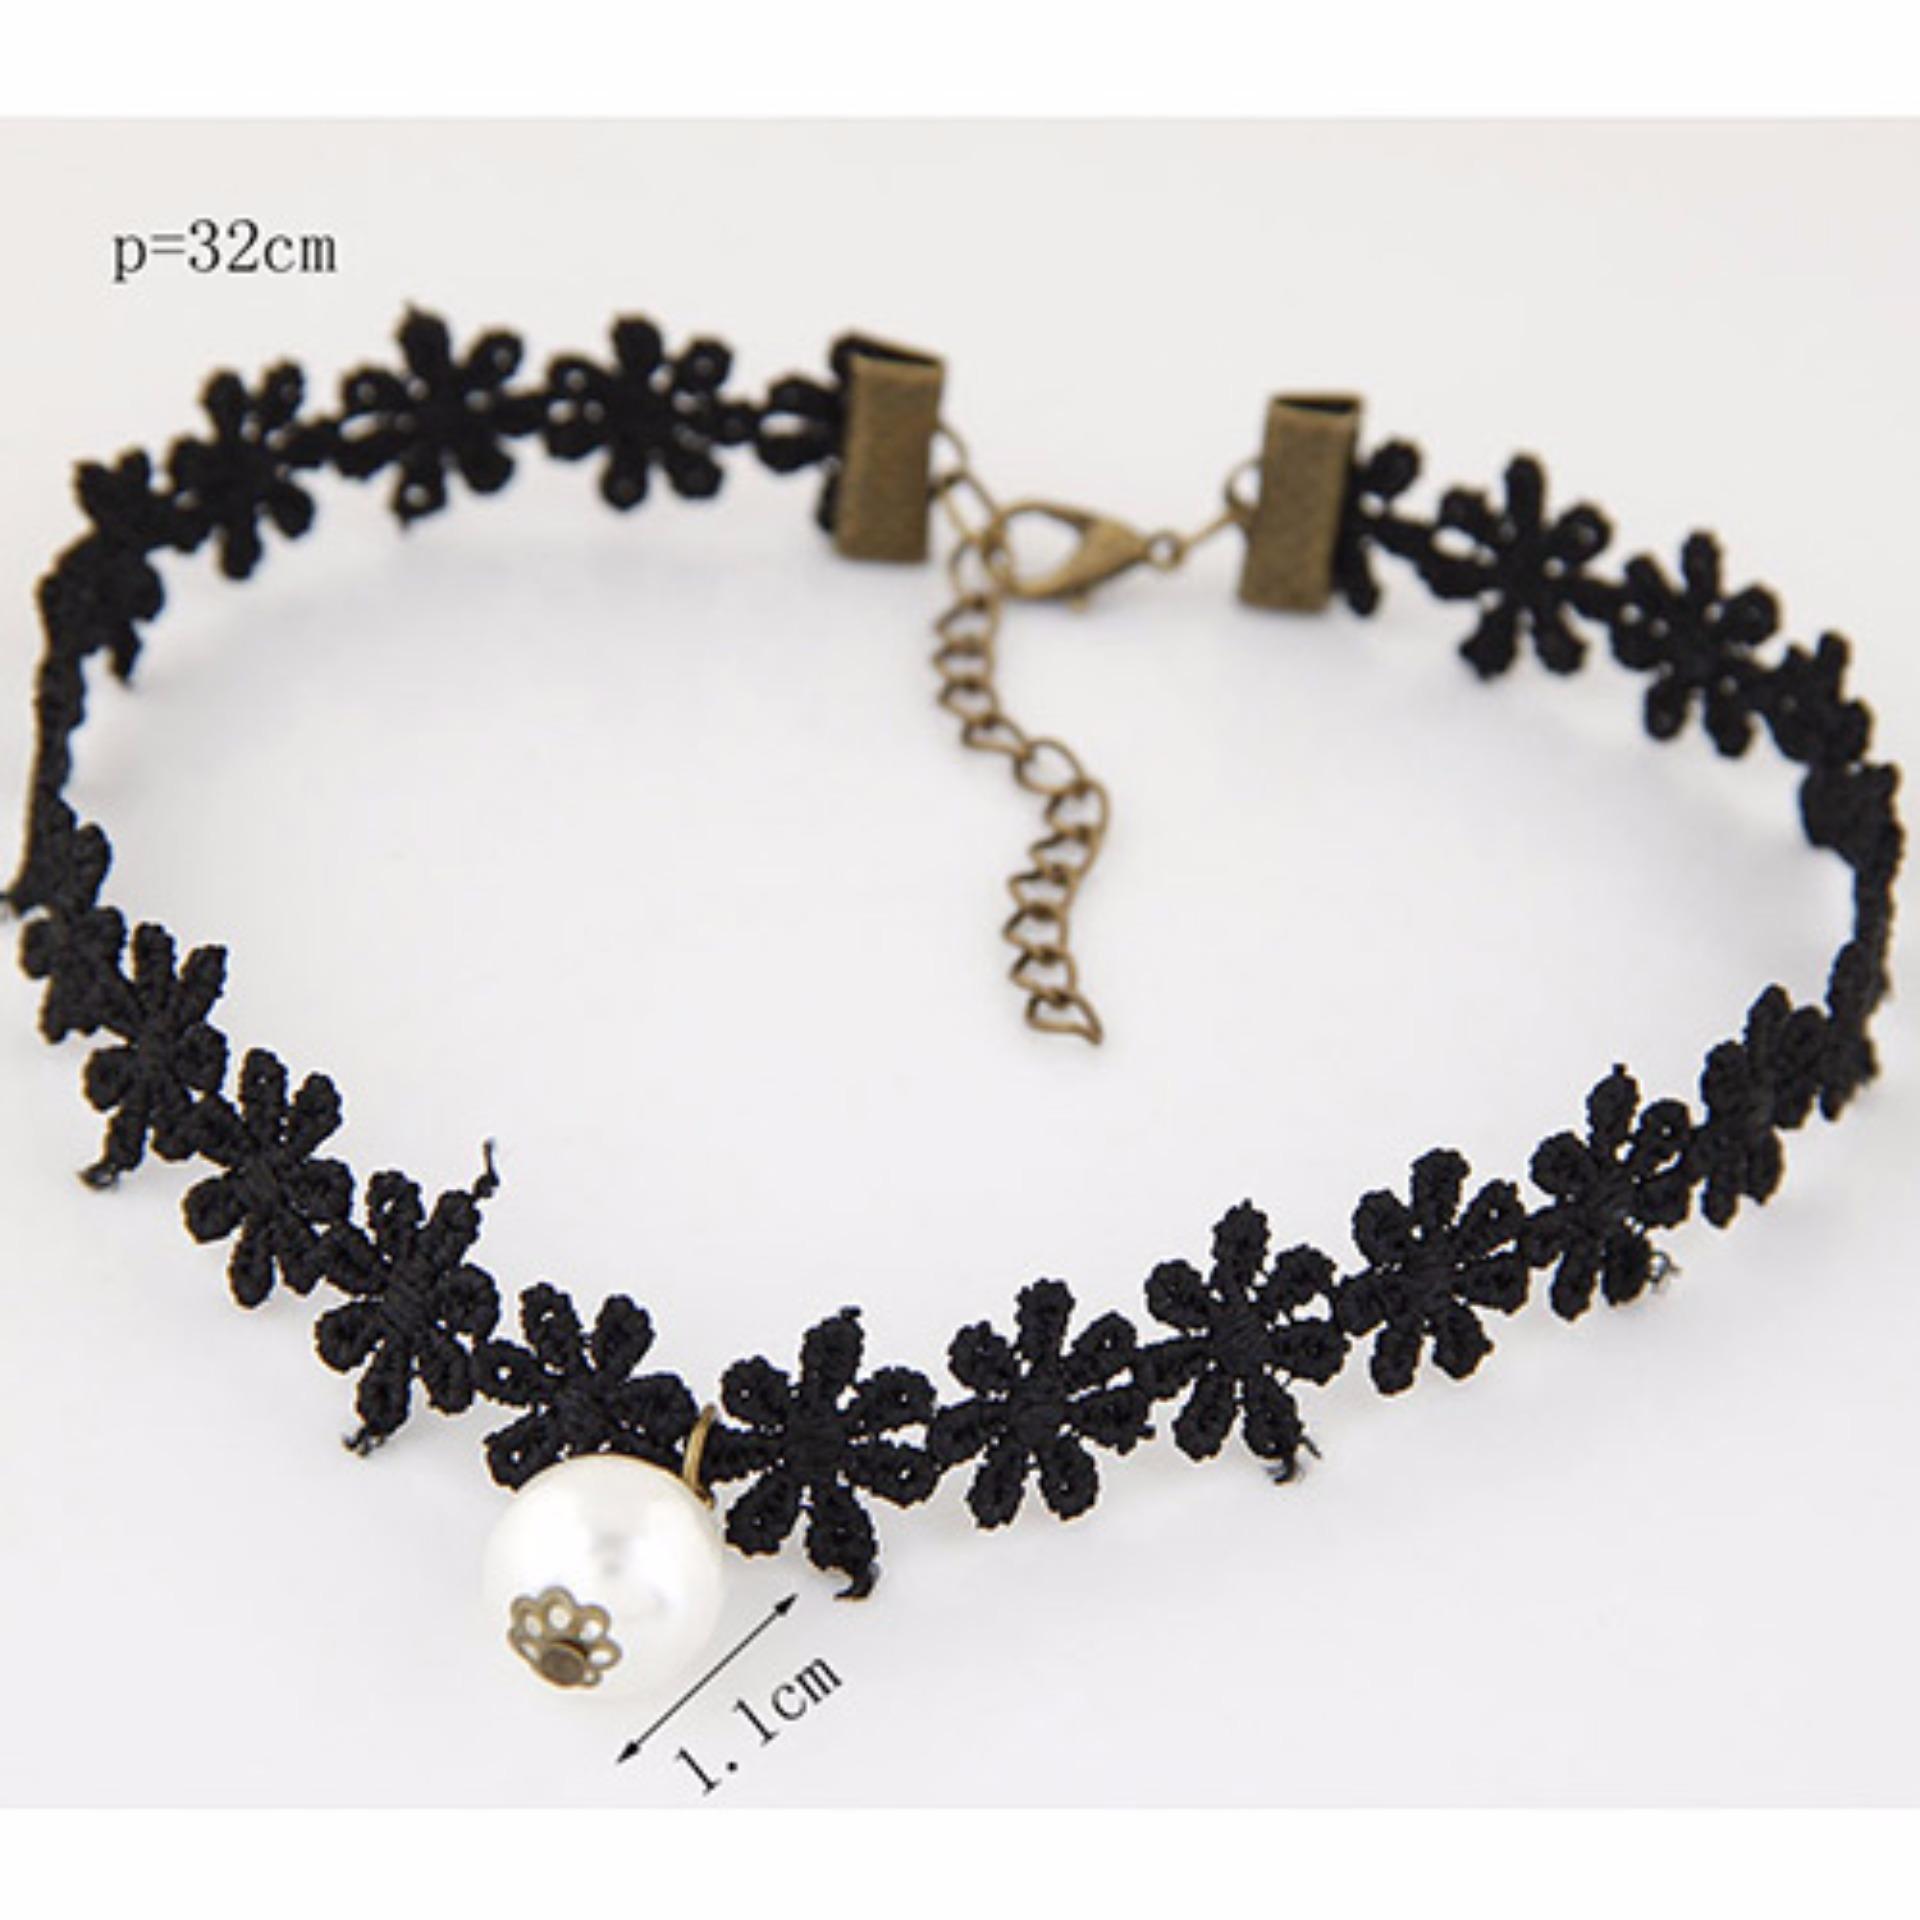 lrc-kalung-wanita -elegant-black-pearl-pendant-decorated-flower-shape-chain-design-1487895538-14998641-98186b564512388e57c5d3abd01bbfa0.jpg